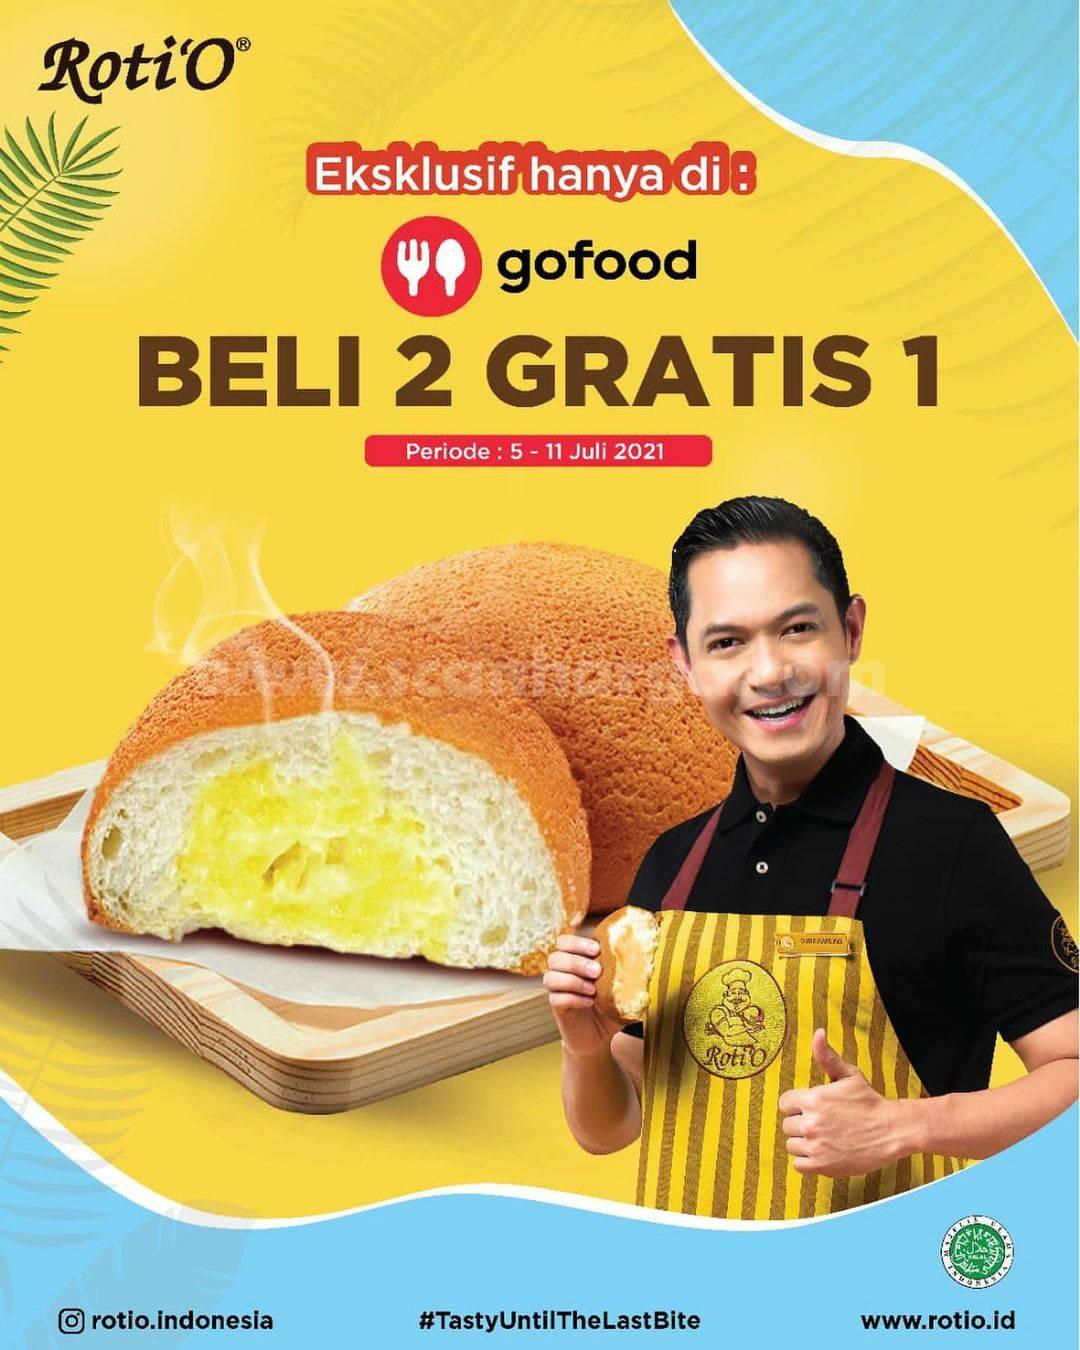 ROTI'O Promo BELI 2 GRATIS 1 Roti O Pesan via GOFOOD